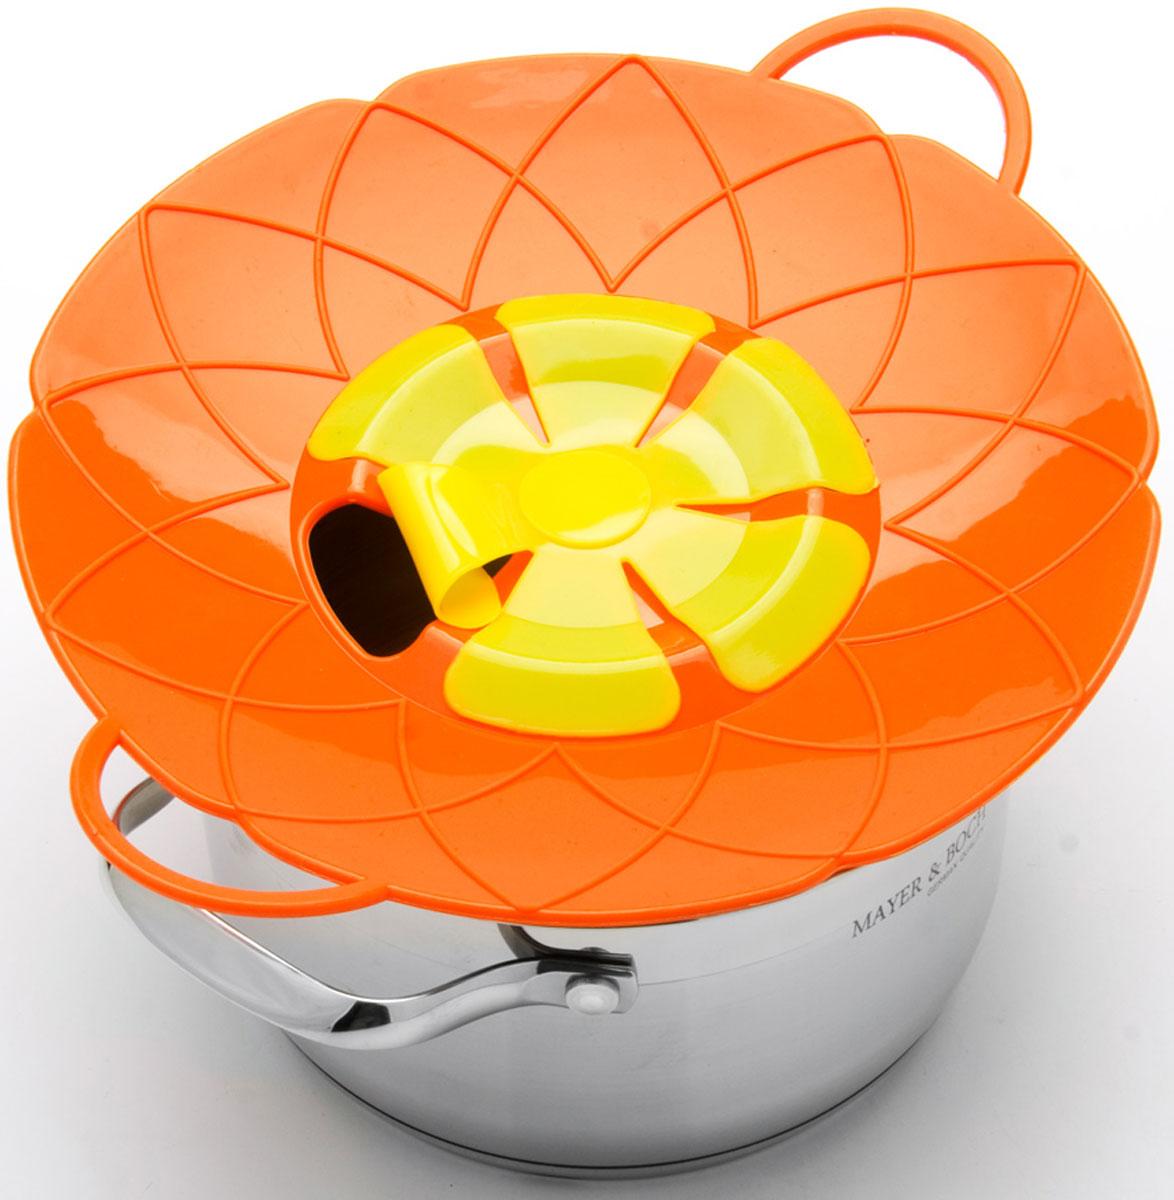 Крышка-невыкипайка Mayer & Boch, цвет: оранжевый, желтый, диаметр 25 см крышка невыкипайка mayer